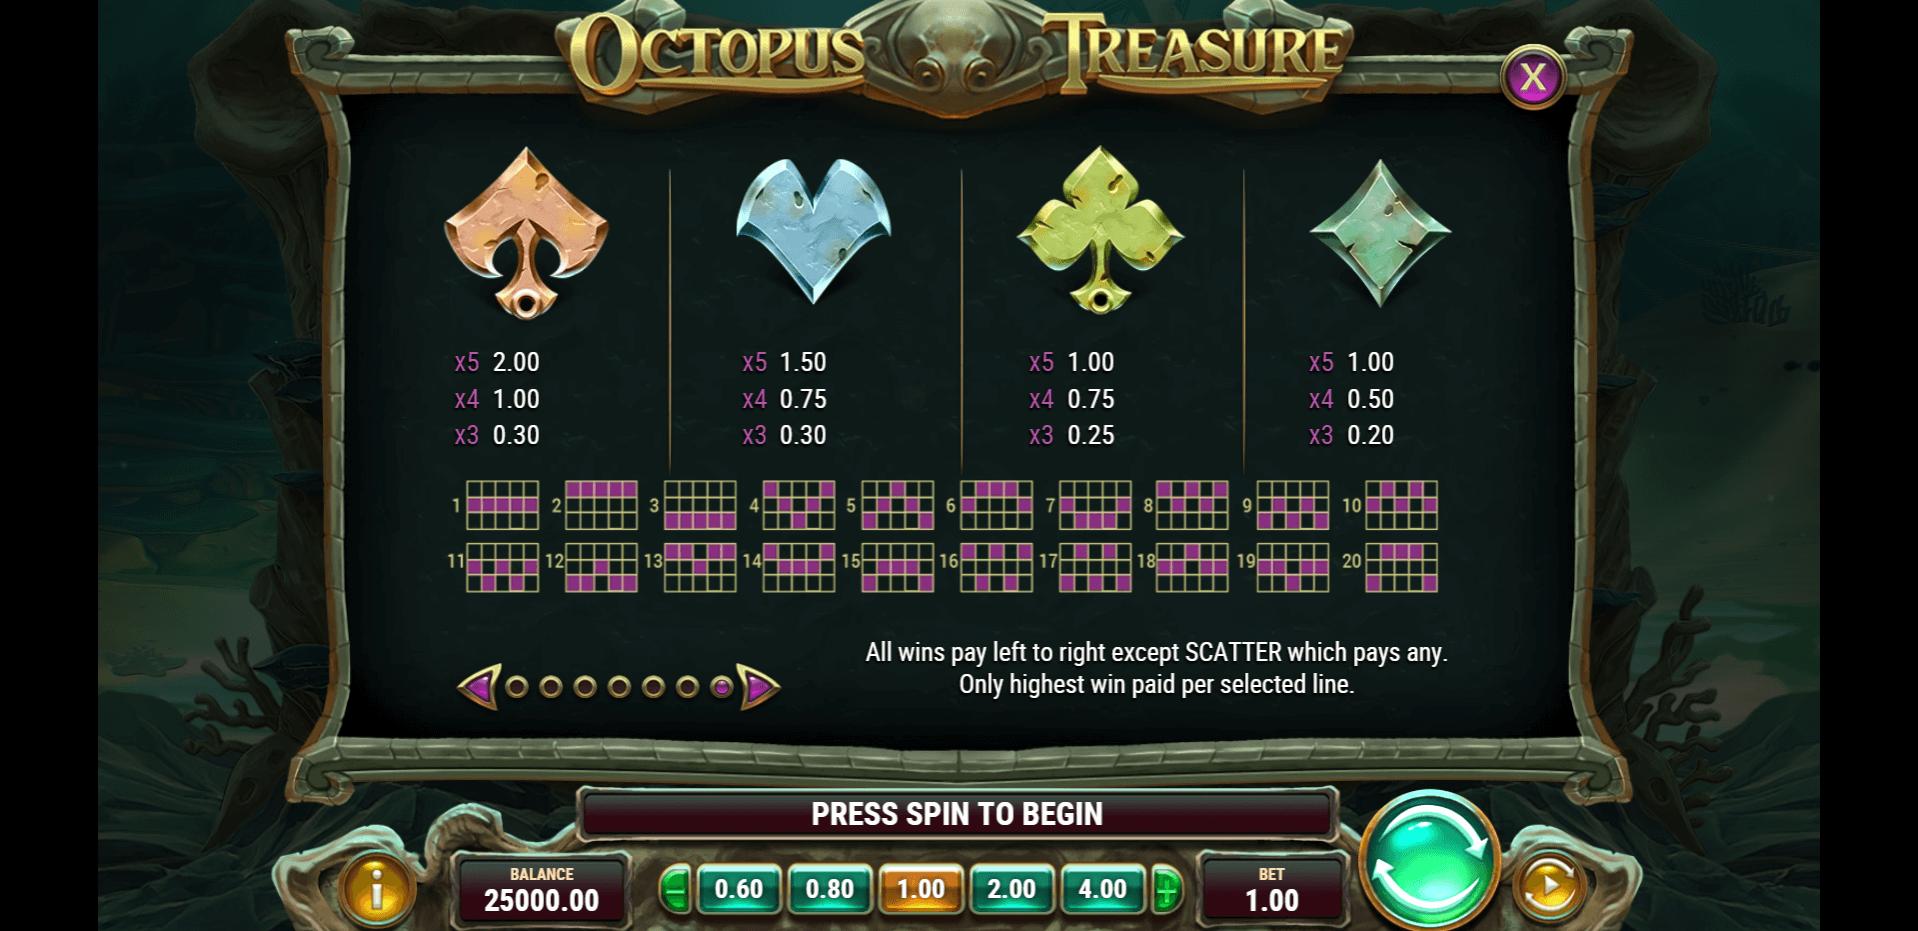 Octopus Treasure Slot Machine